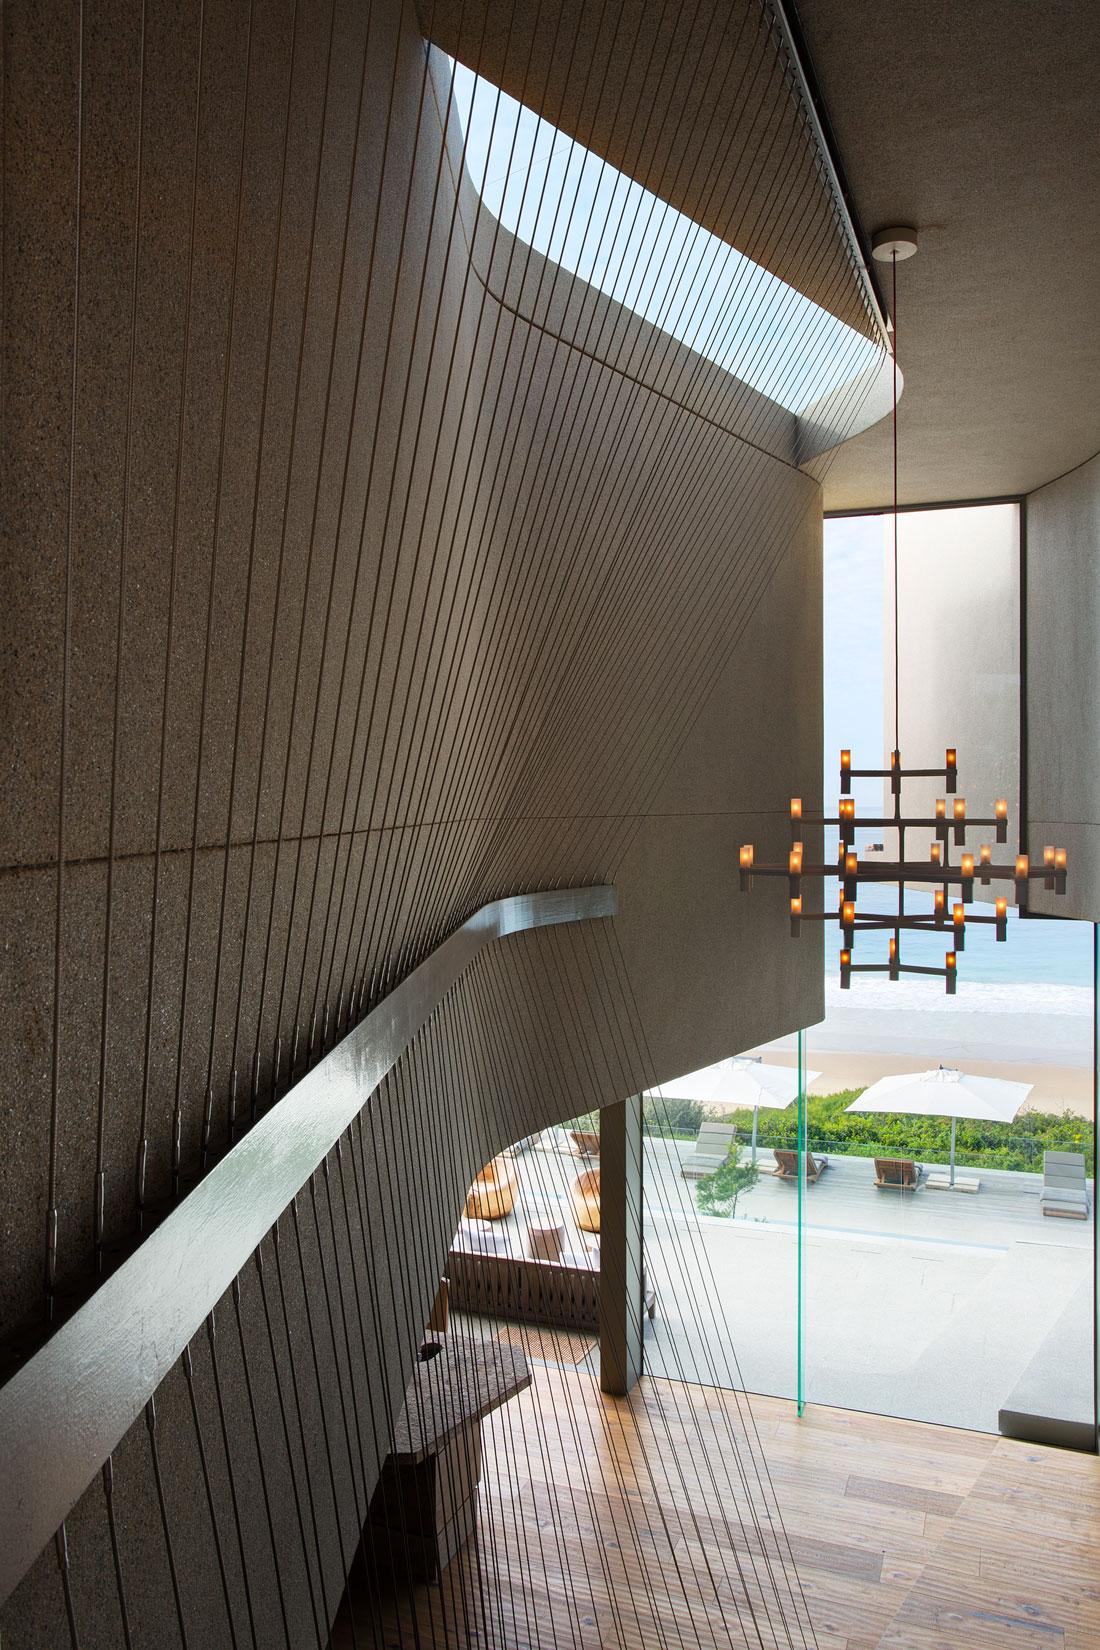 architecture-design-villa-luxuryhouse-southafrica-plettenbergbay-08